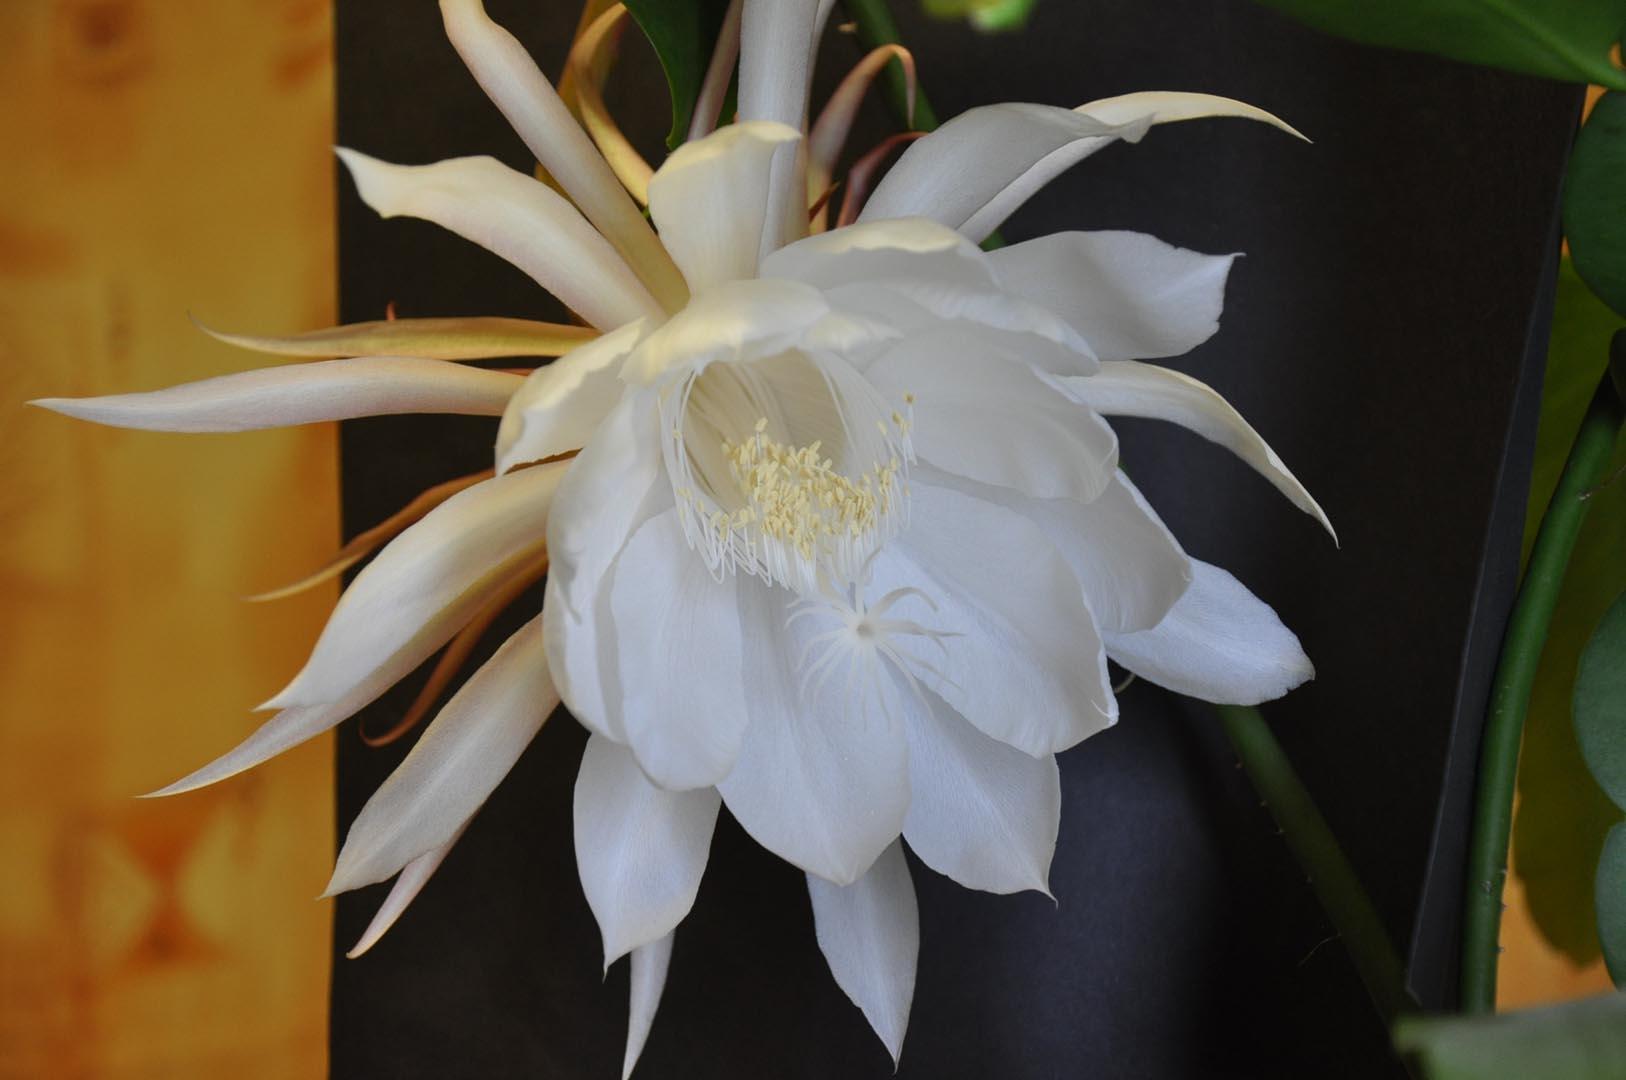 Květ vdetailu